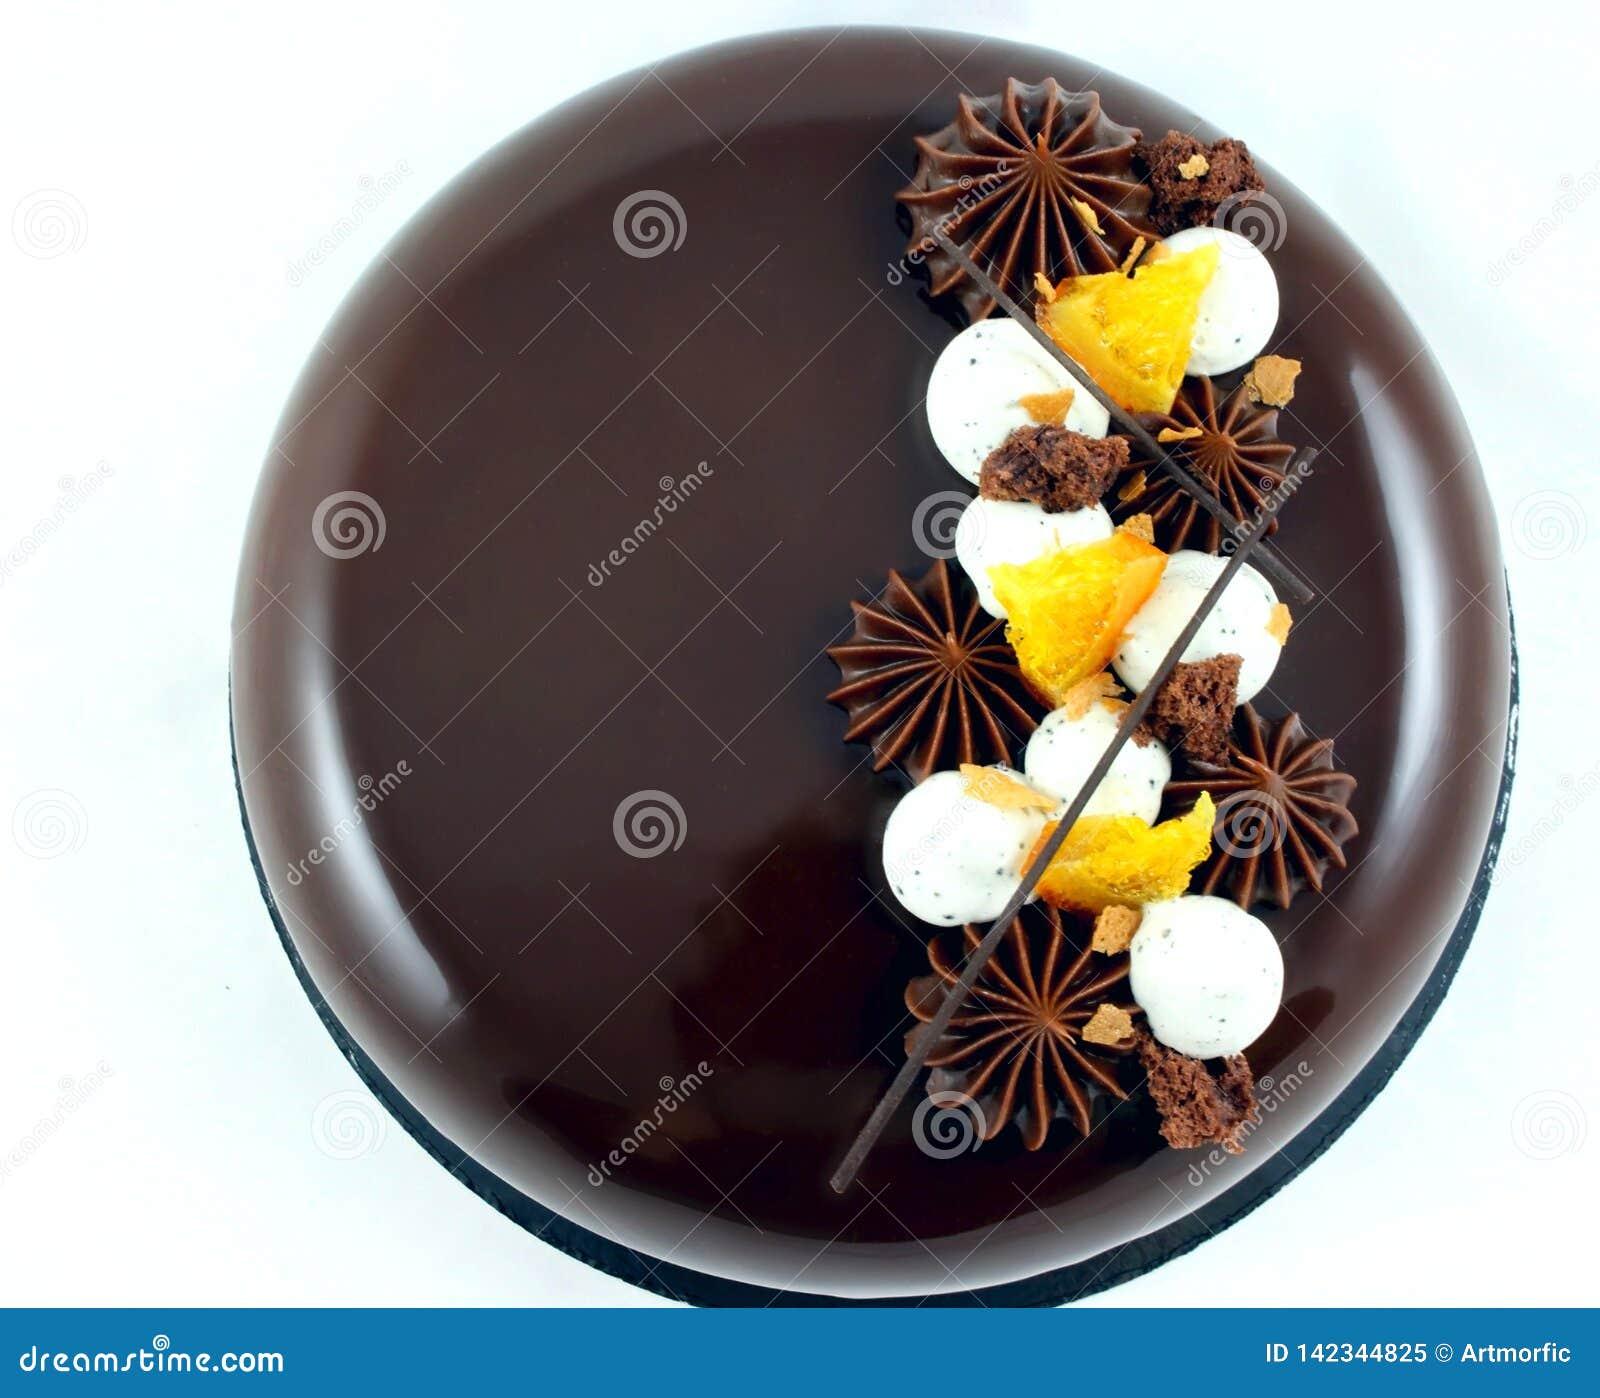 Chocolate and orange cake with chocolate ganache stars and whipped cream top view